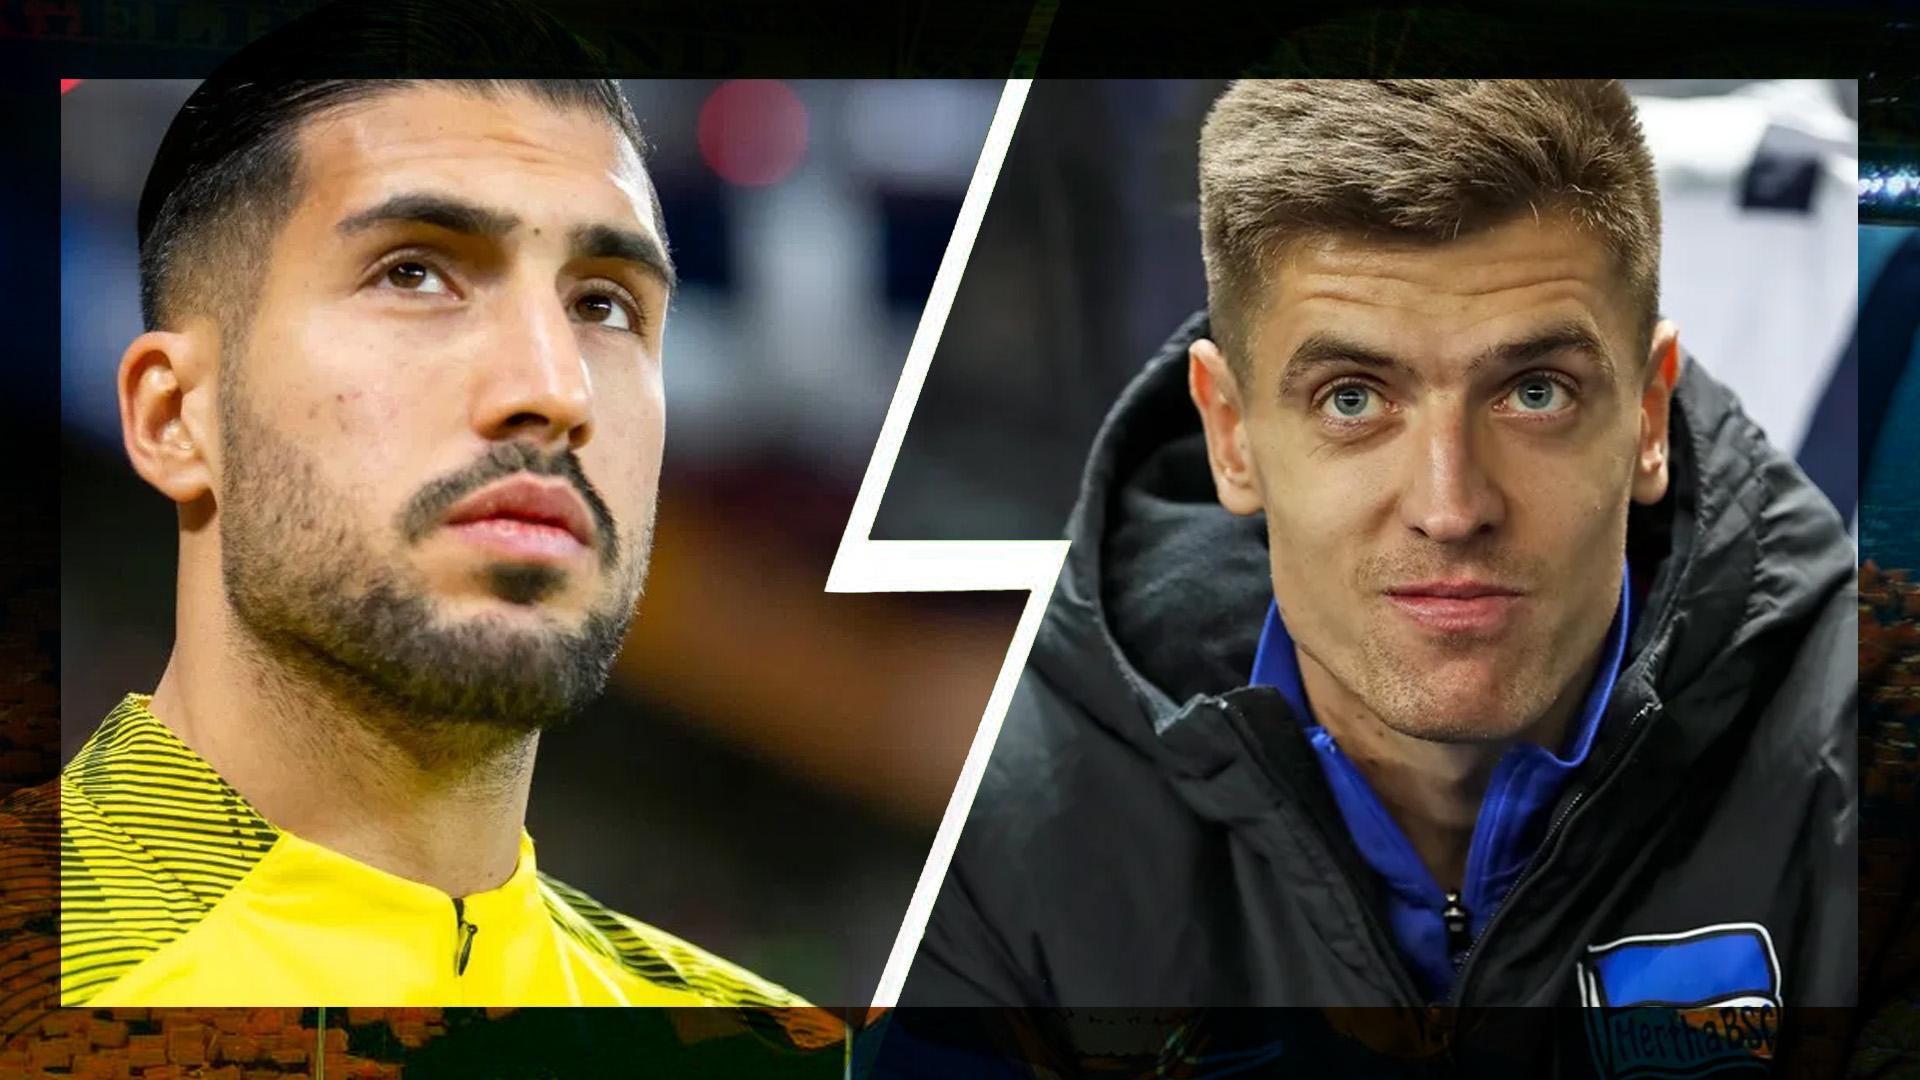 Archaf_Hakimi_Javairo_Dilrosun_Dortmund_Herta_Berlin_Bundesliga